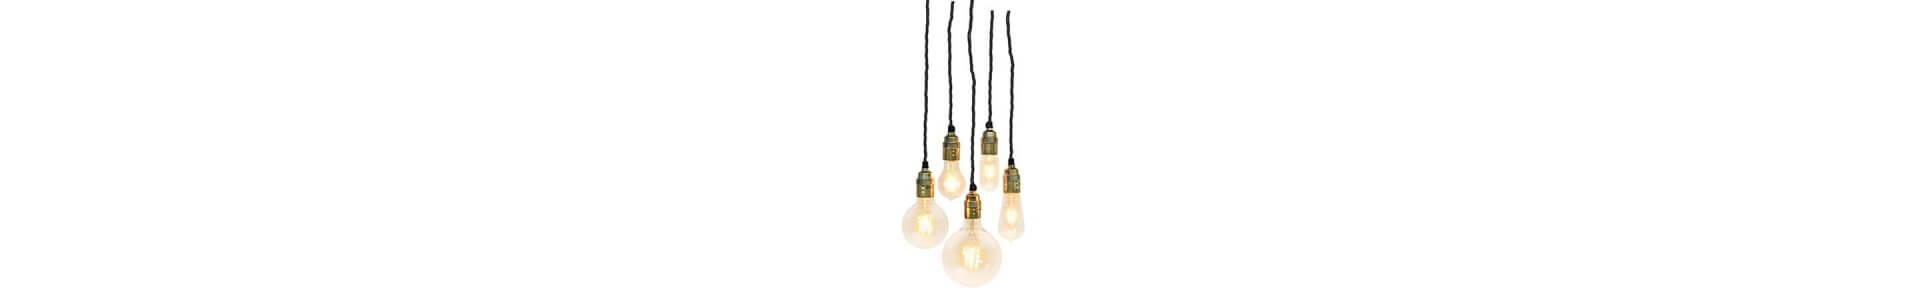 Ljuskällor - Ledlampor